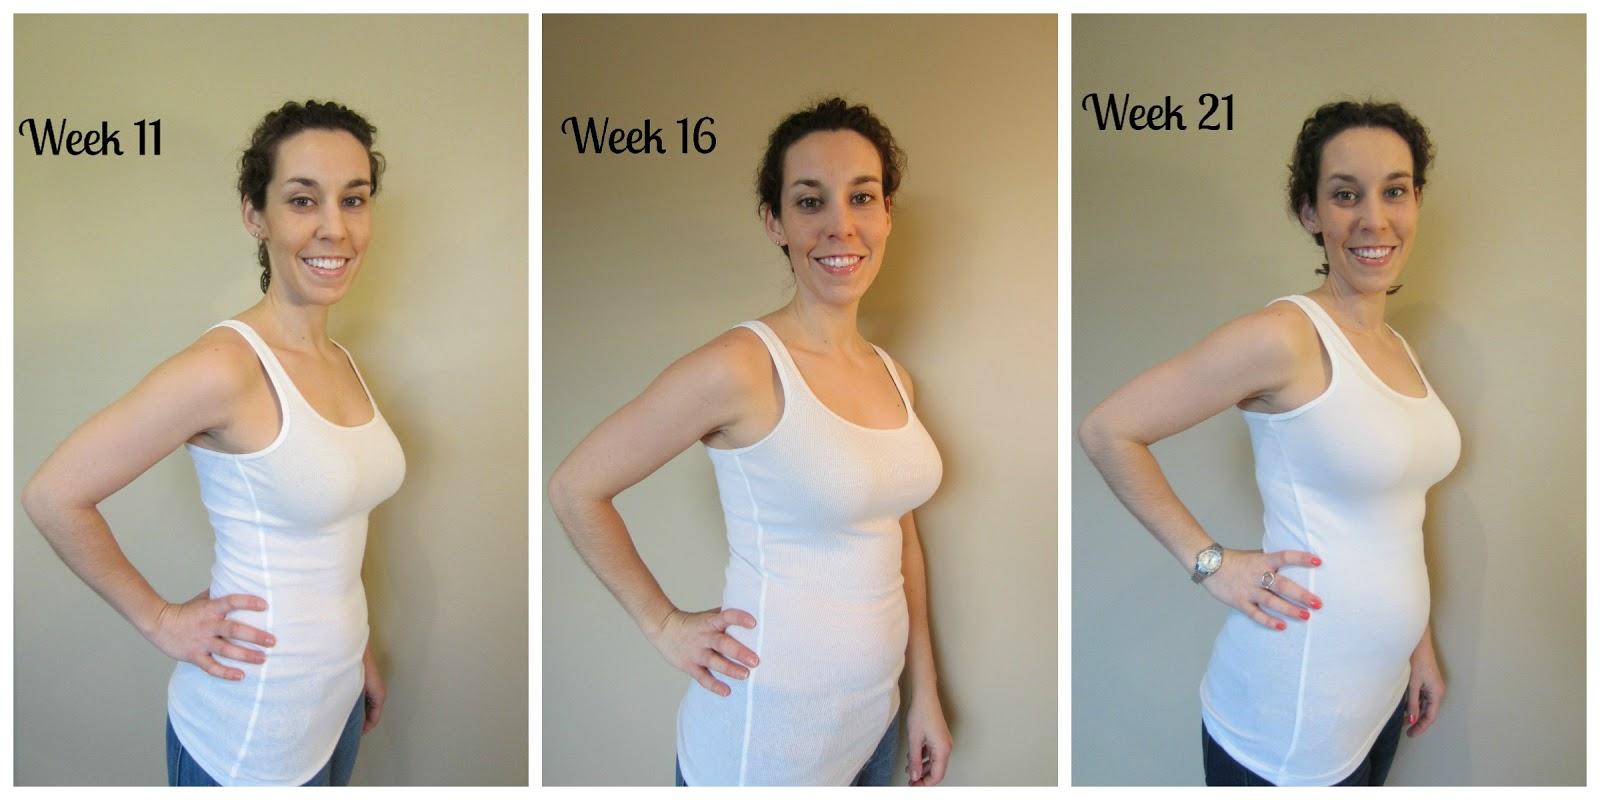 21 Weeks Baby Size Related Keywords & Suggestions - 21 Weeks Baby